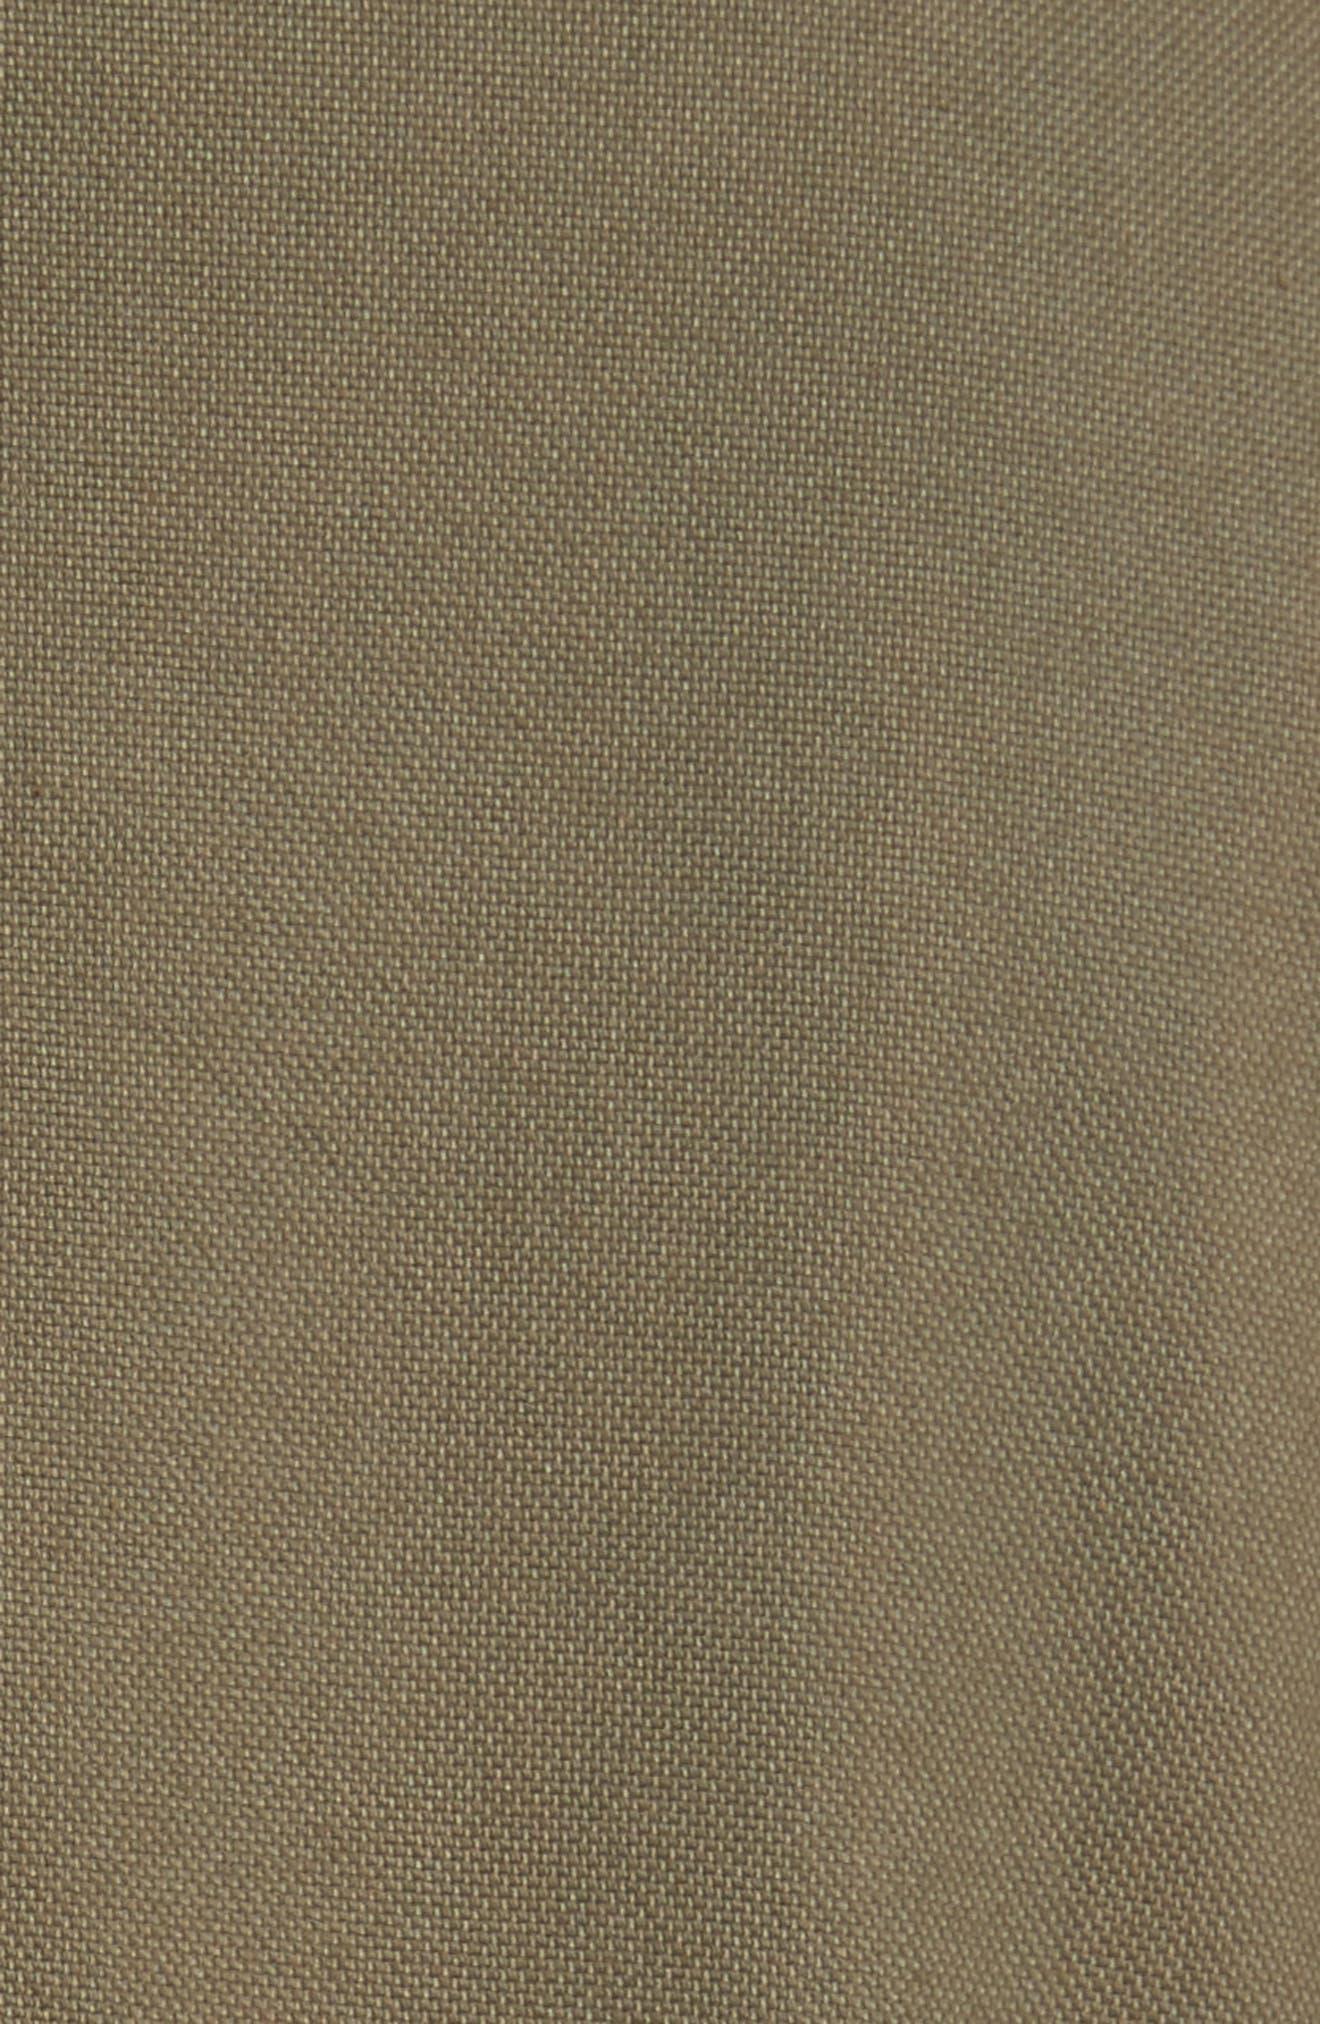 Everglade Peplum Jacket,                             Alternate thumbnail 5, color,                             Army Green